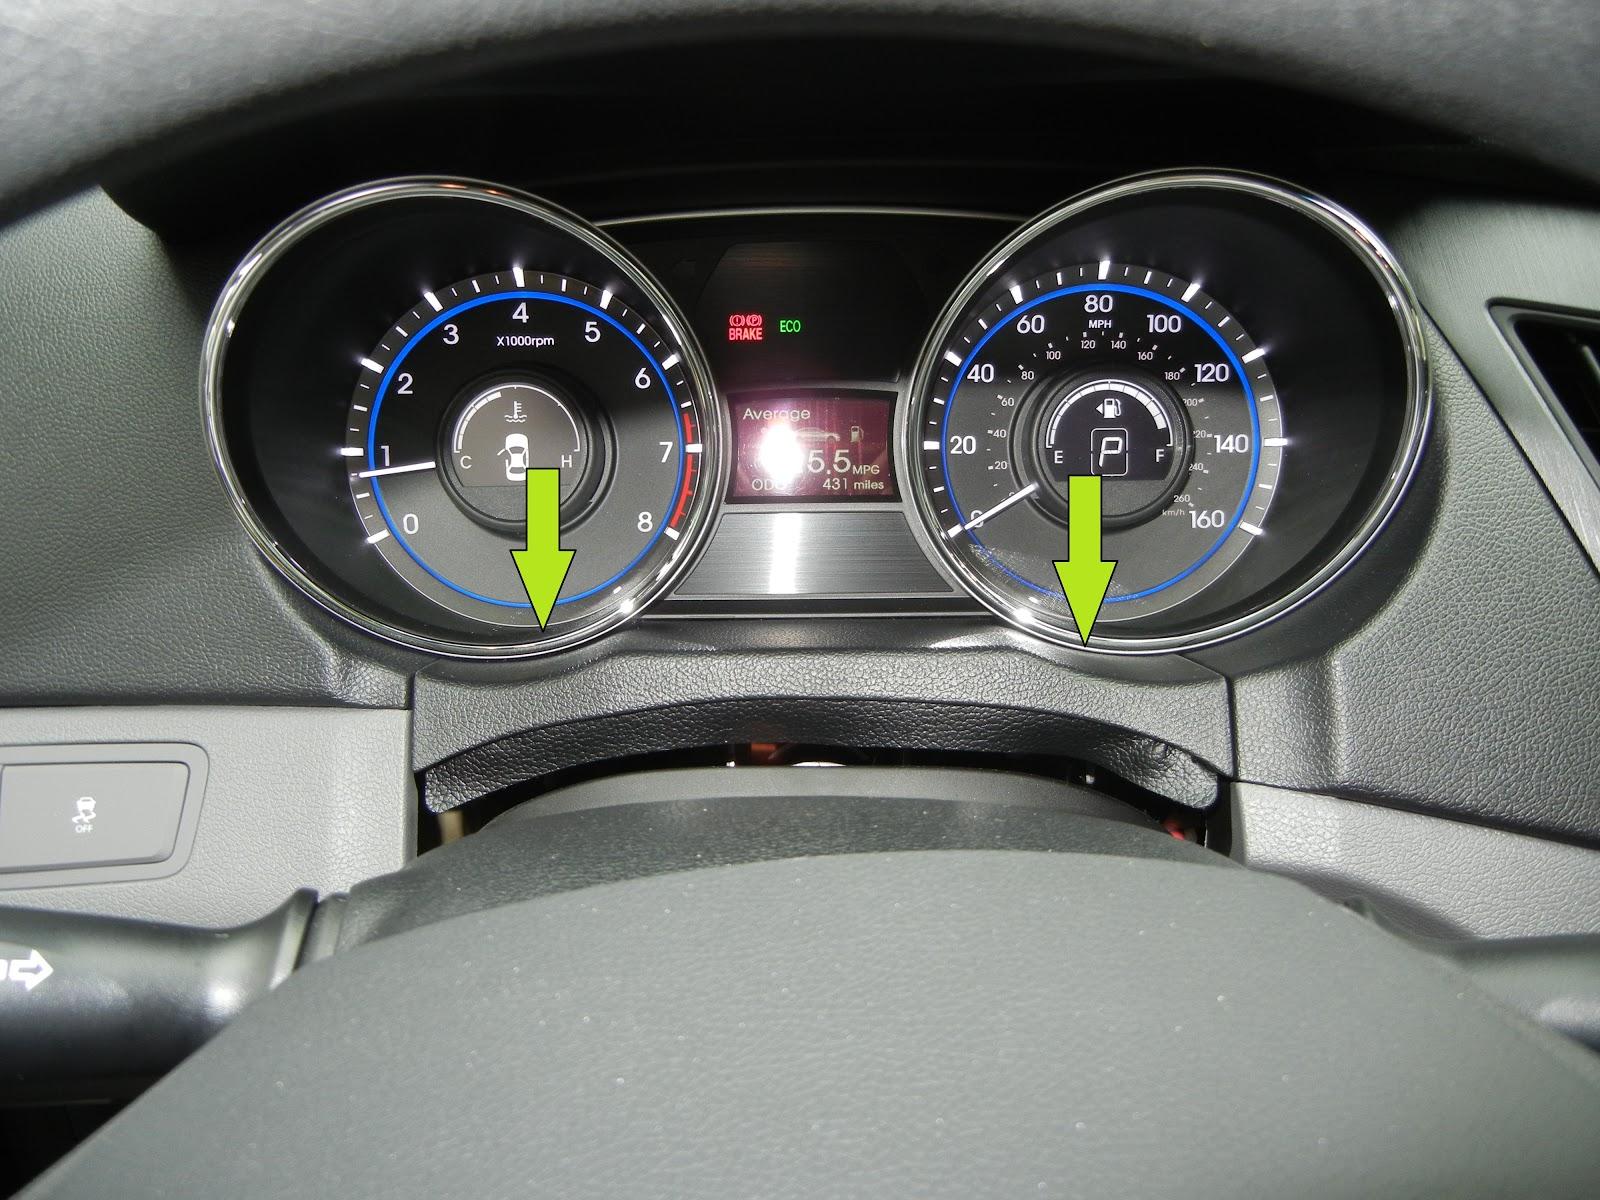 Hyundai Elantra: Removal